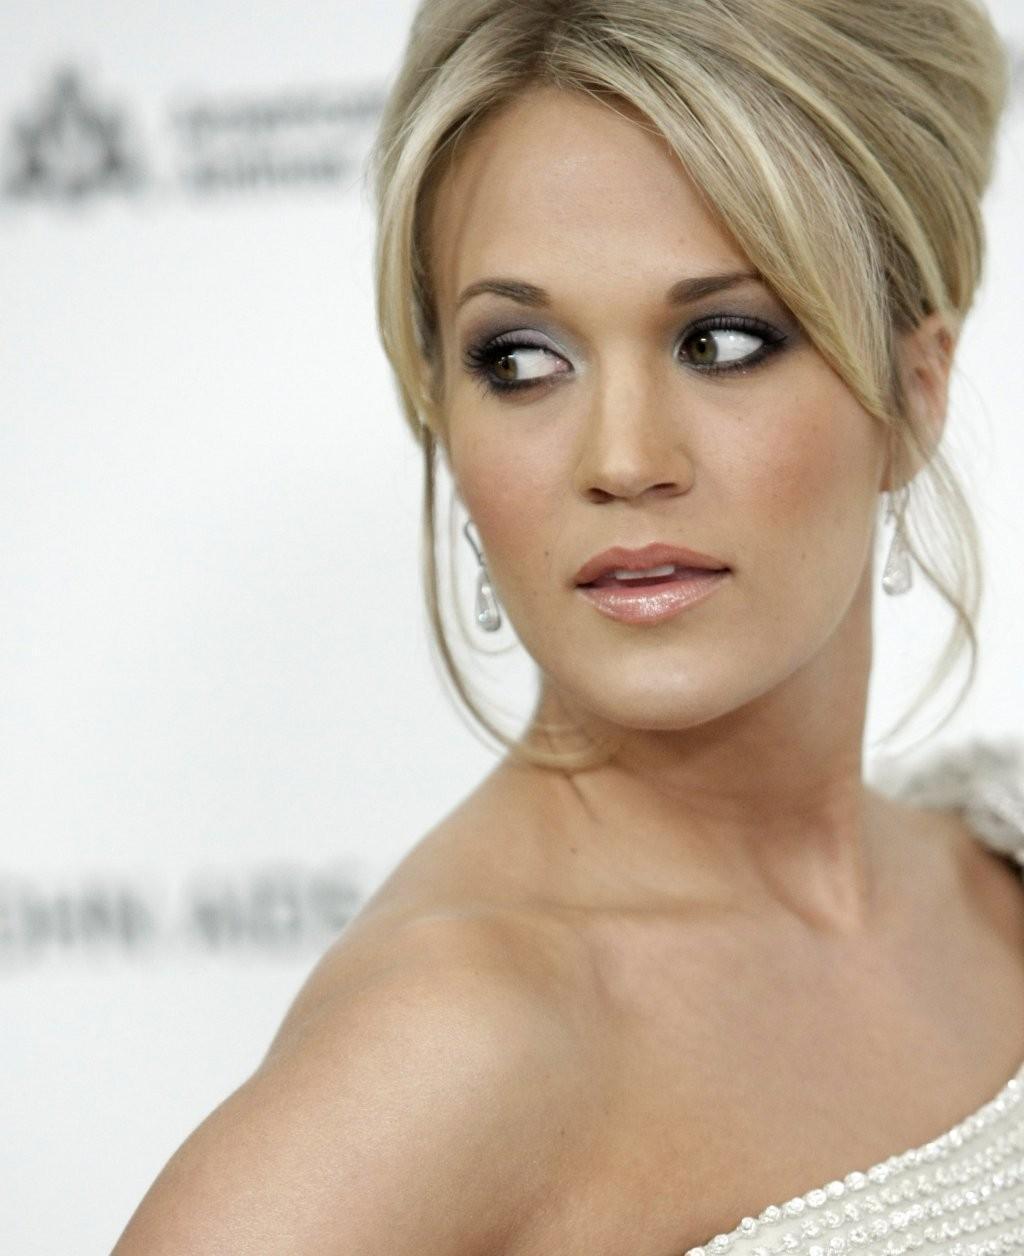 Carrie Underwood Carrie Underwood Swimsuit